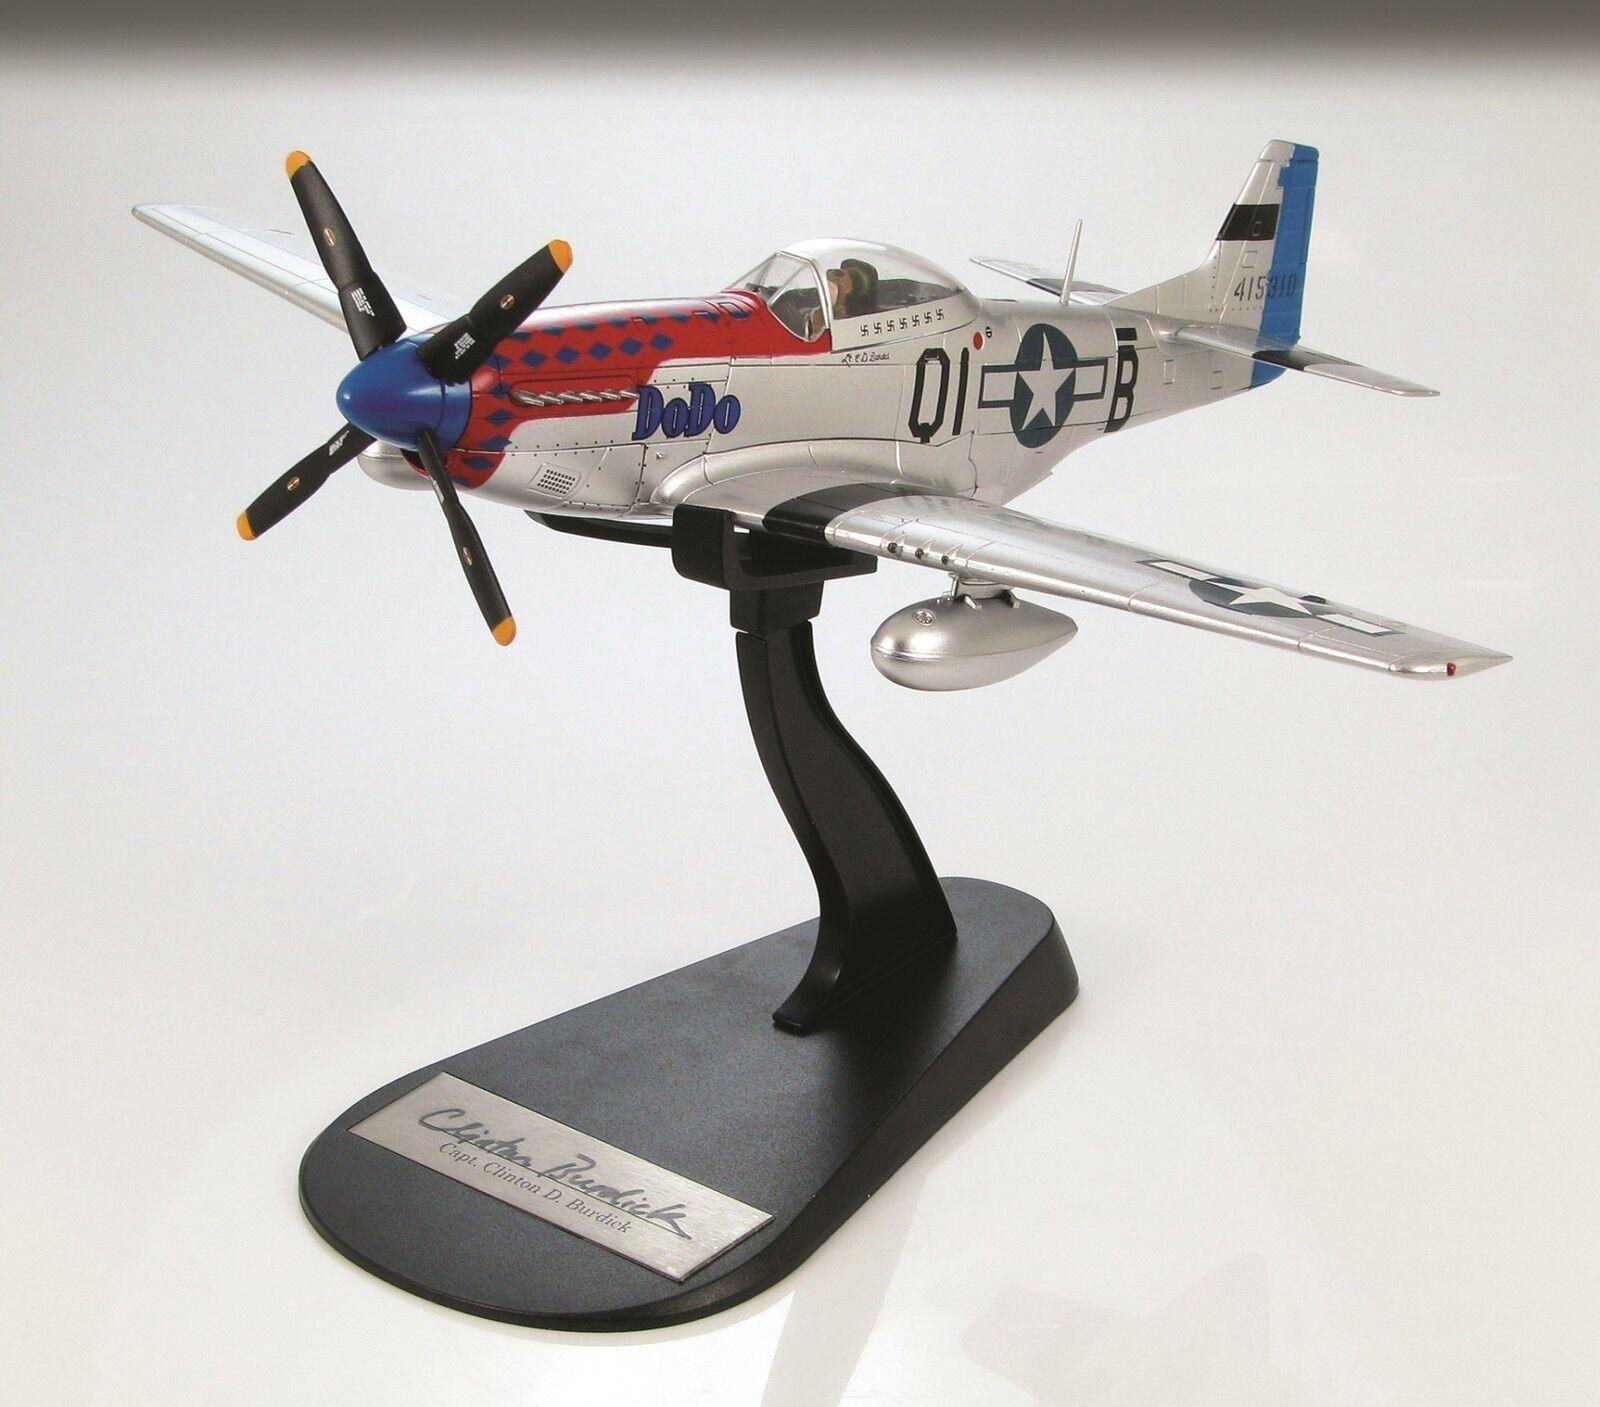 Hobby Master 1 48 P - P-51d Mustang 356th Fg. 361st FS Dodo Segno Distintivo